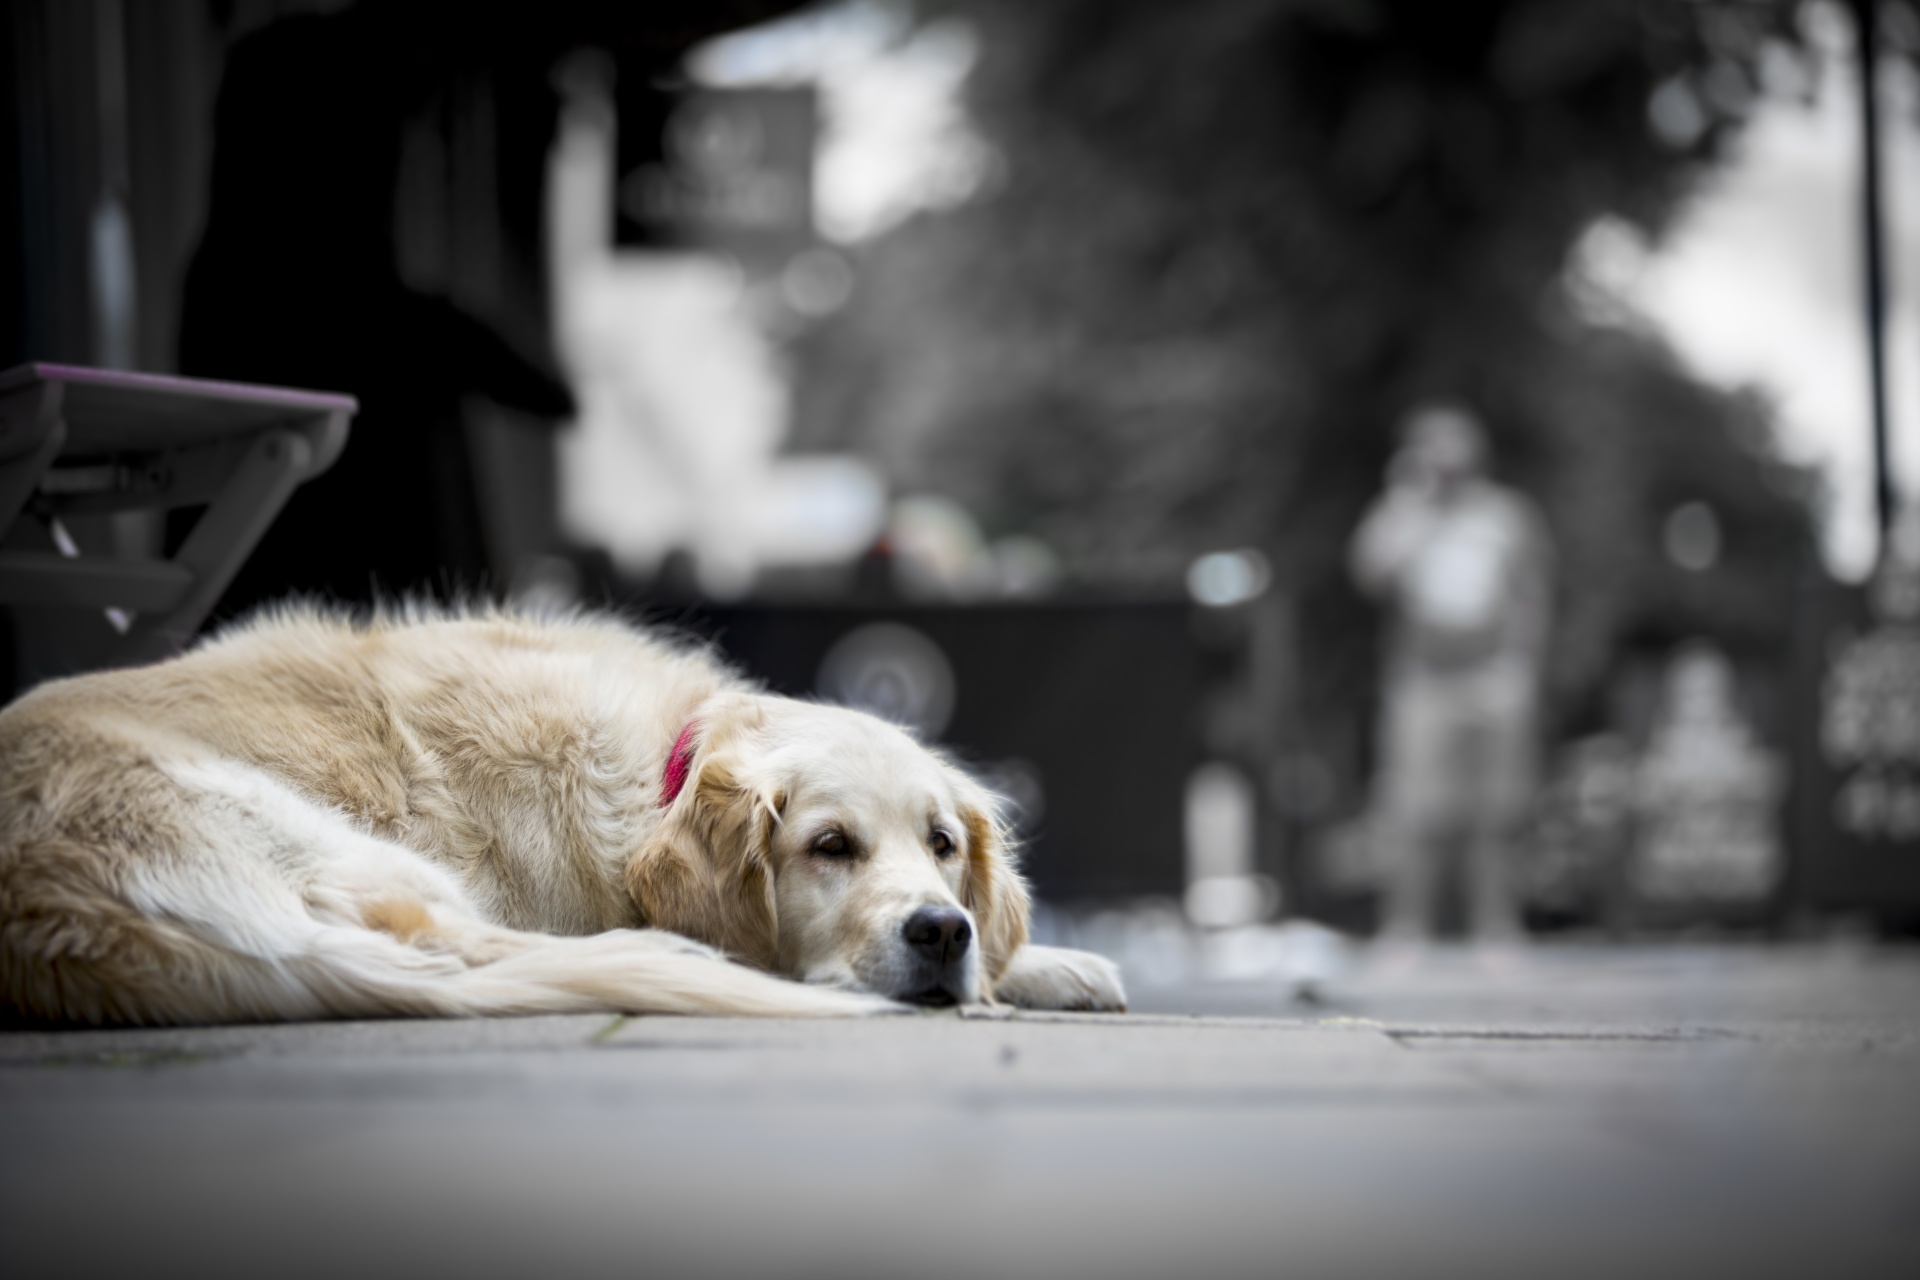 Sad_Dog.jpg